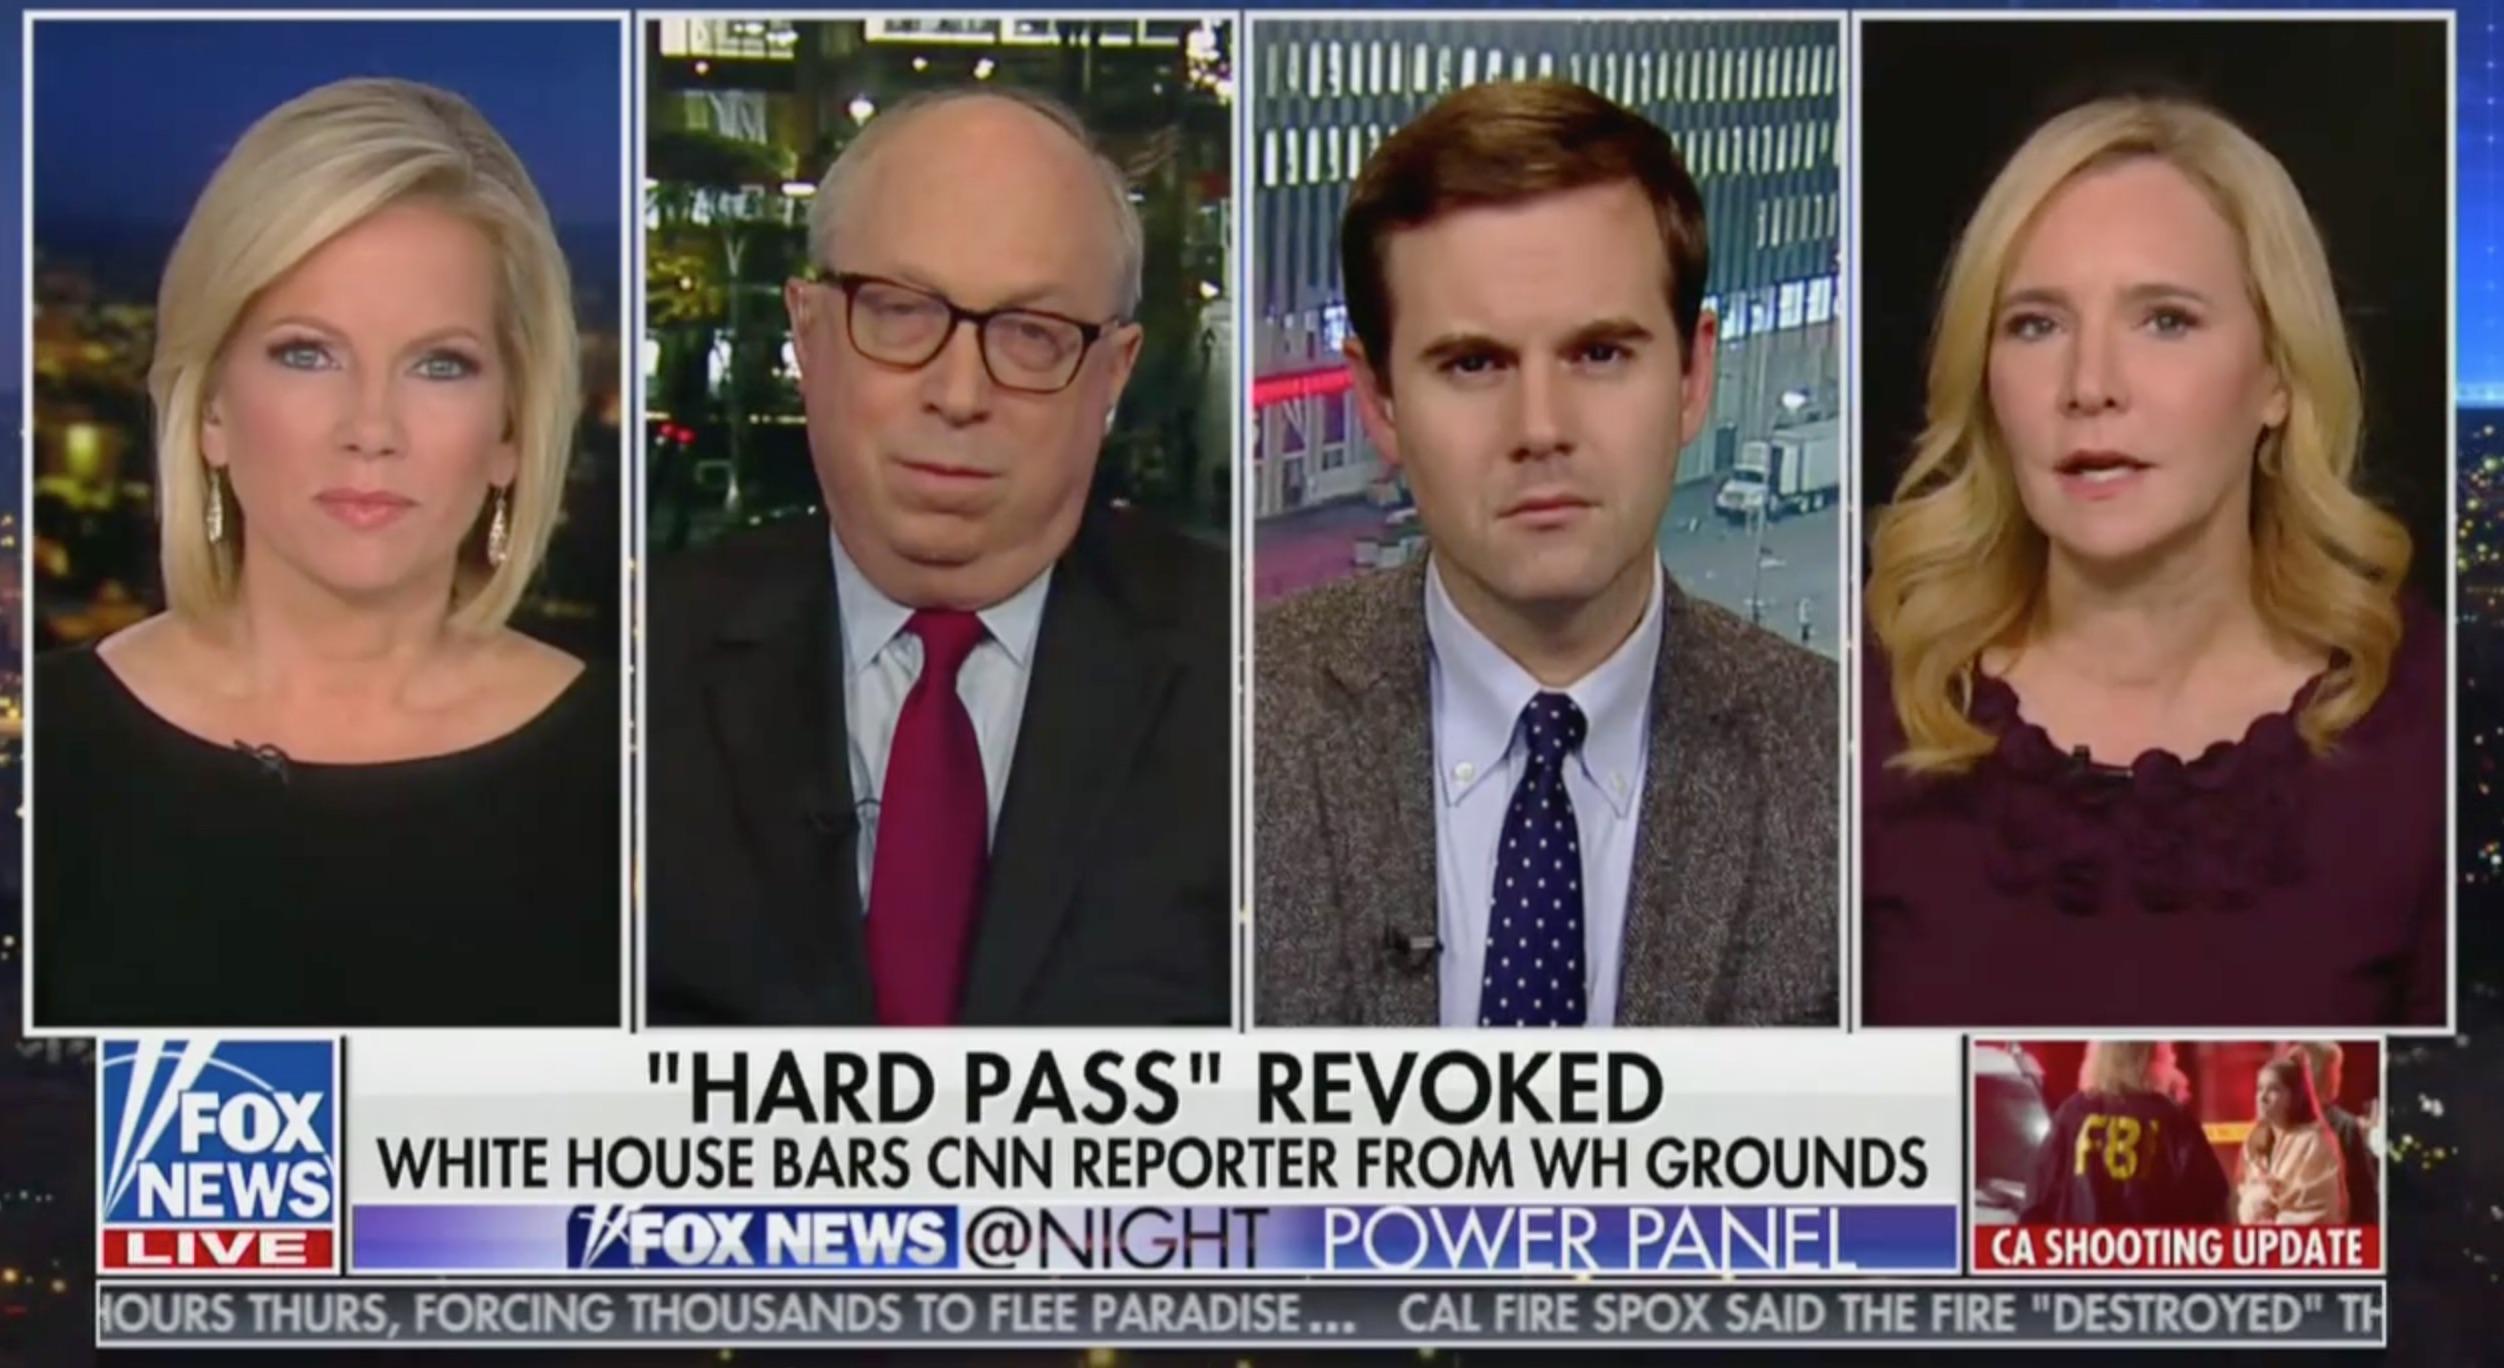 AB Stoddard: WH Pulling Jim Acostas Press Pass Was Kremlinesque